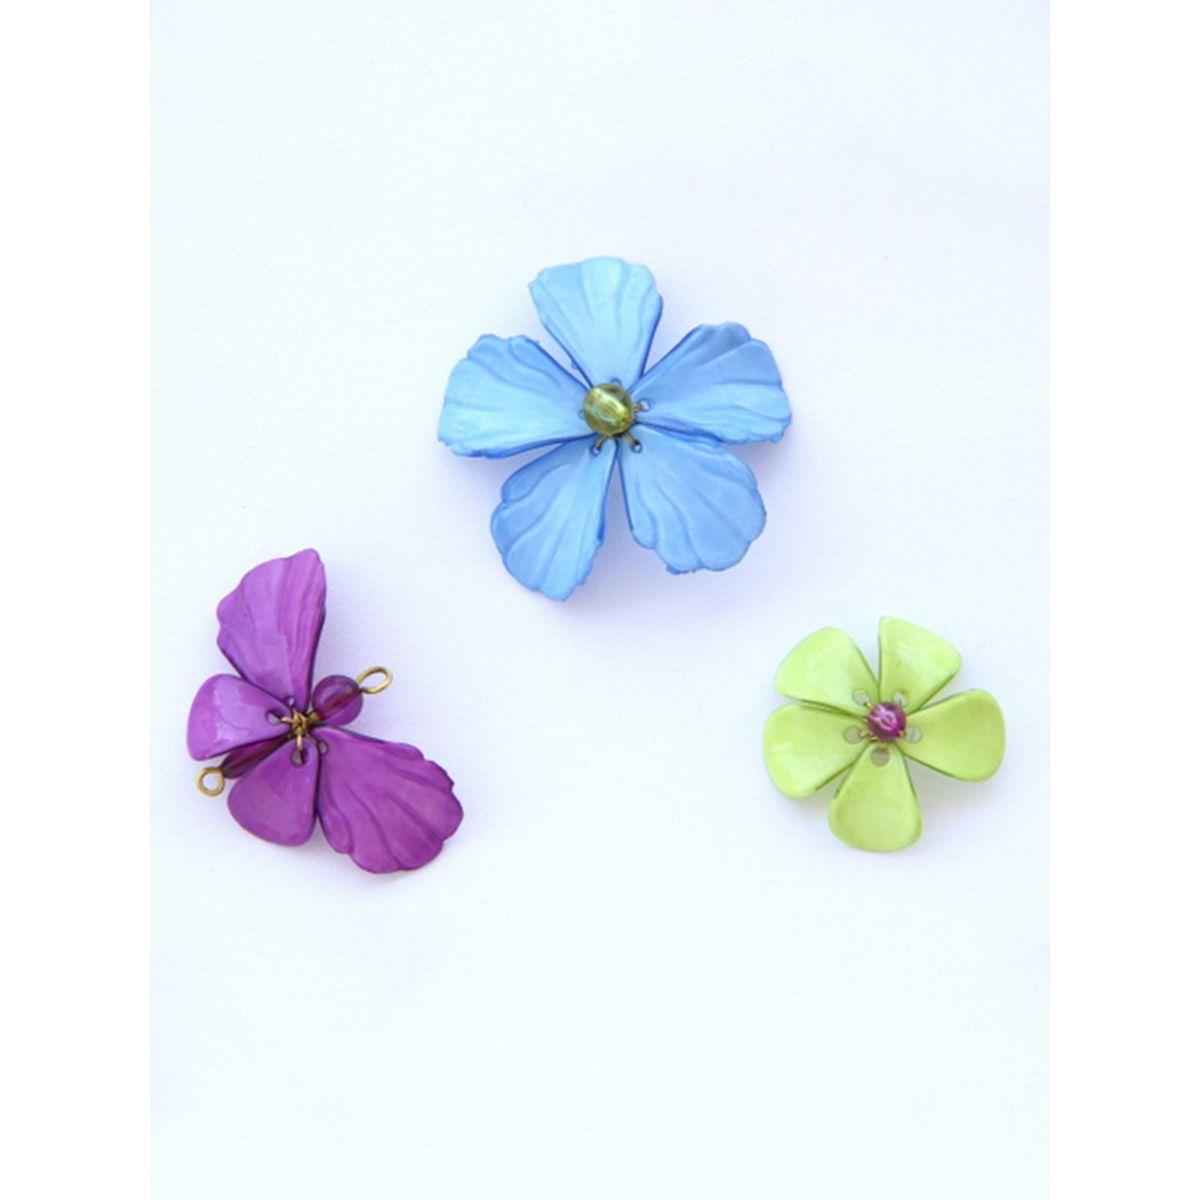 Kanhai Spring Rainy Quirky Fridge Magnets